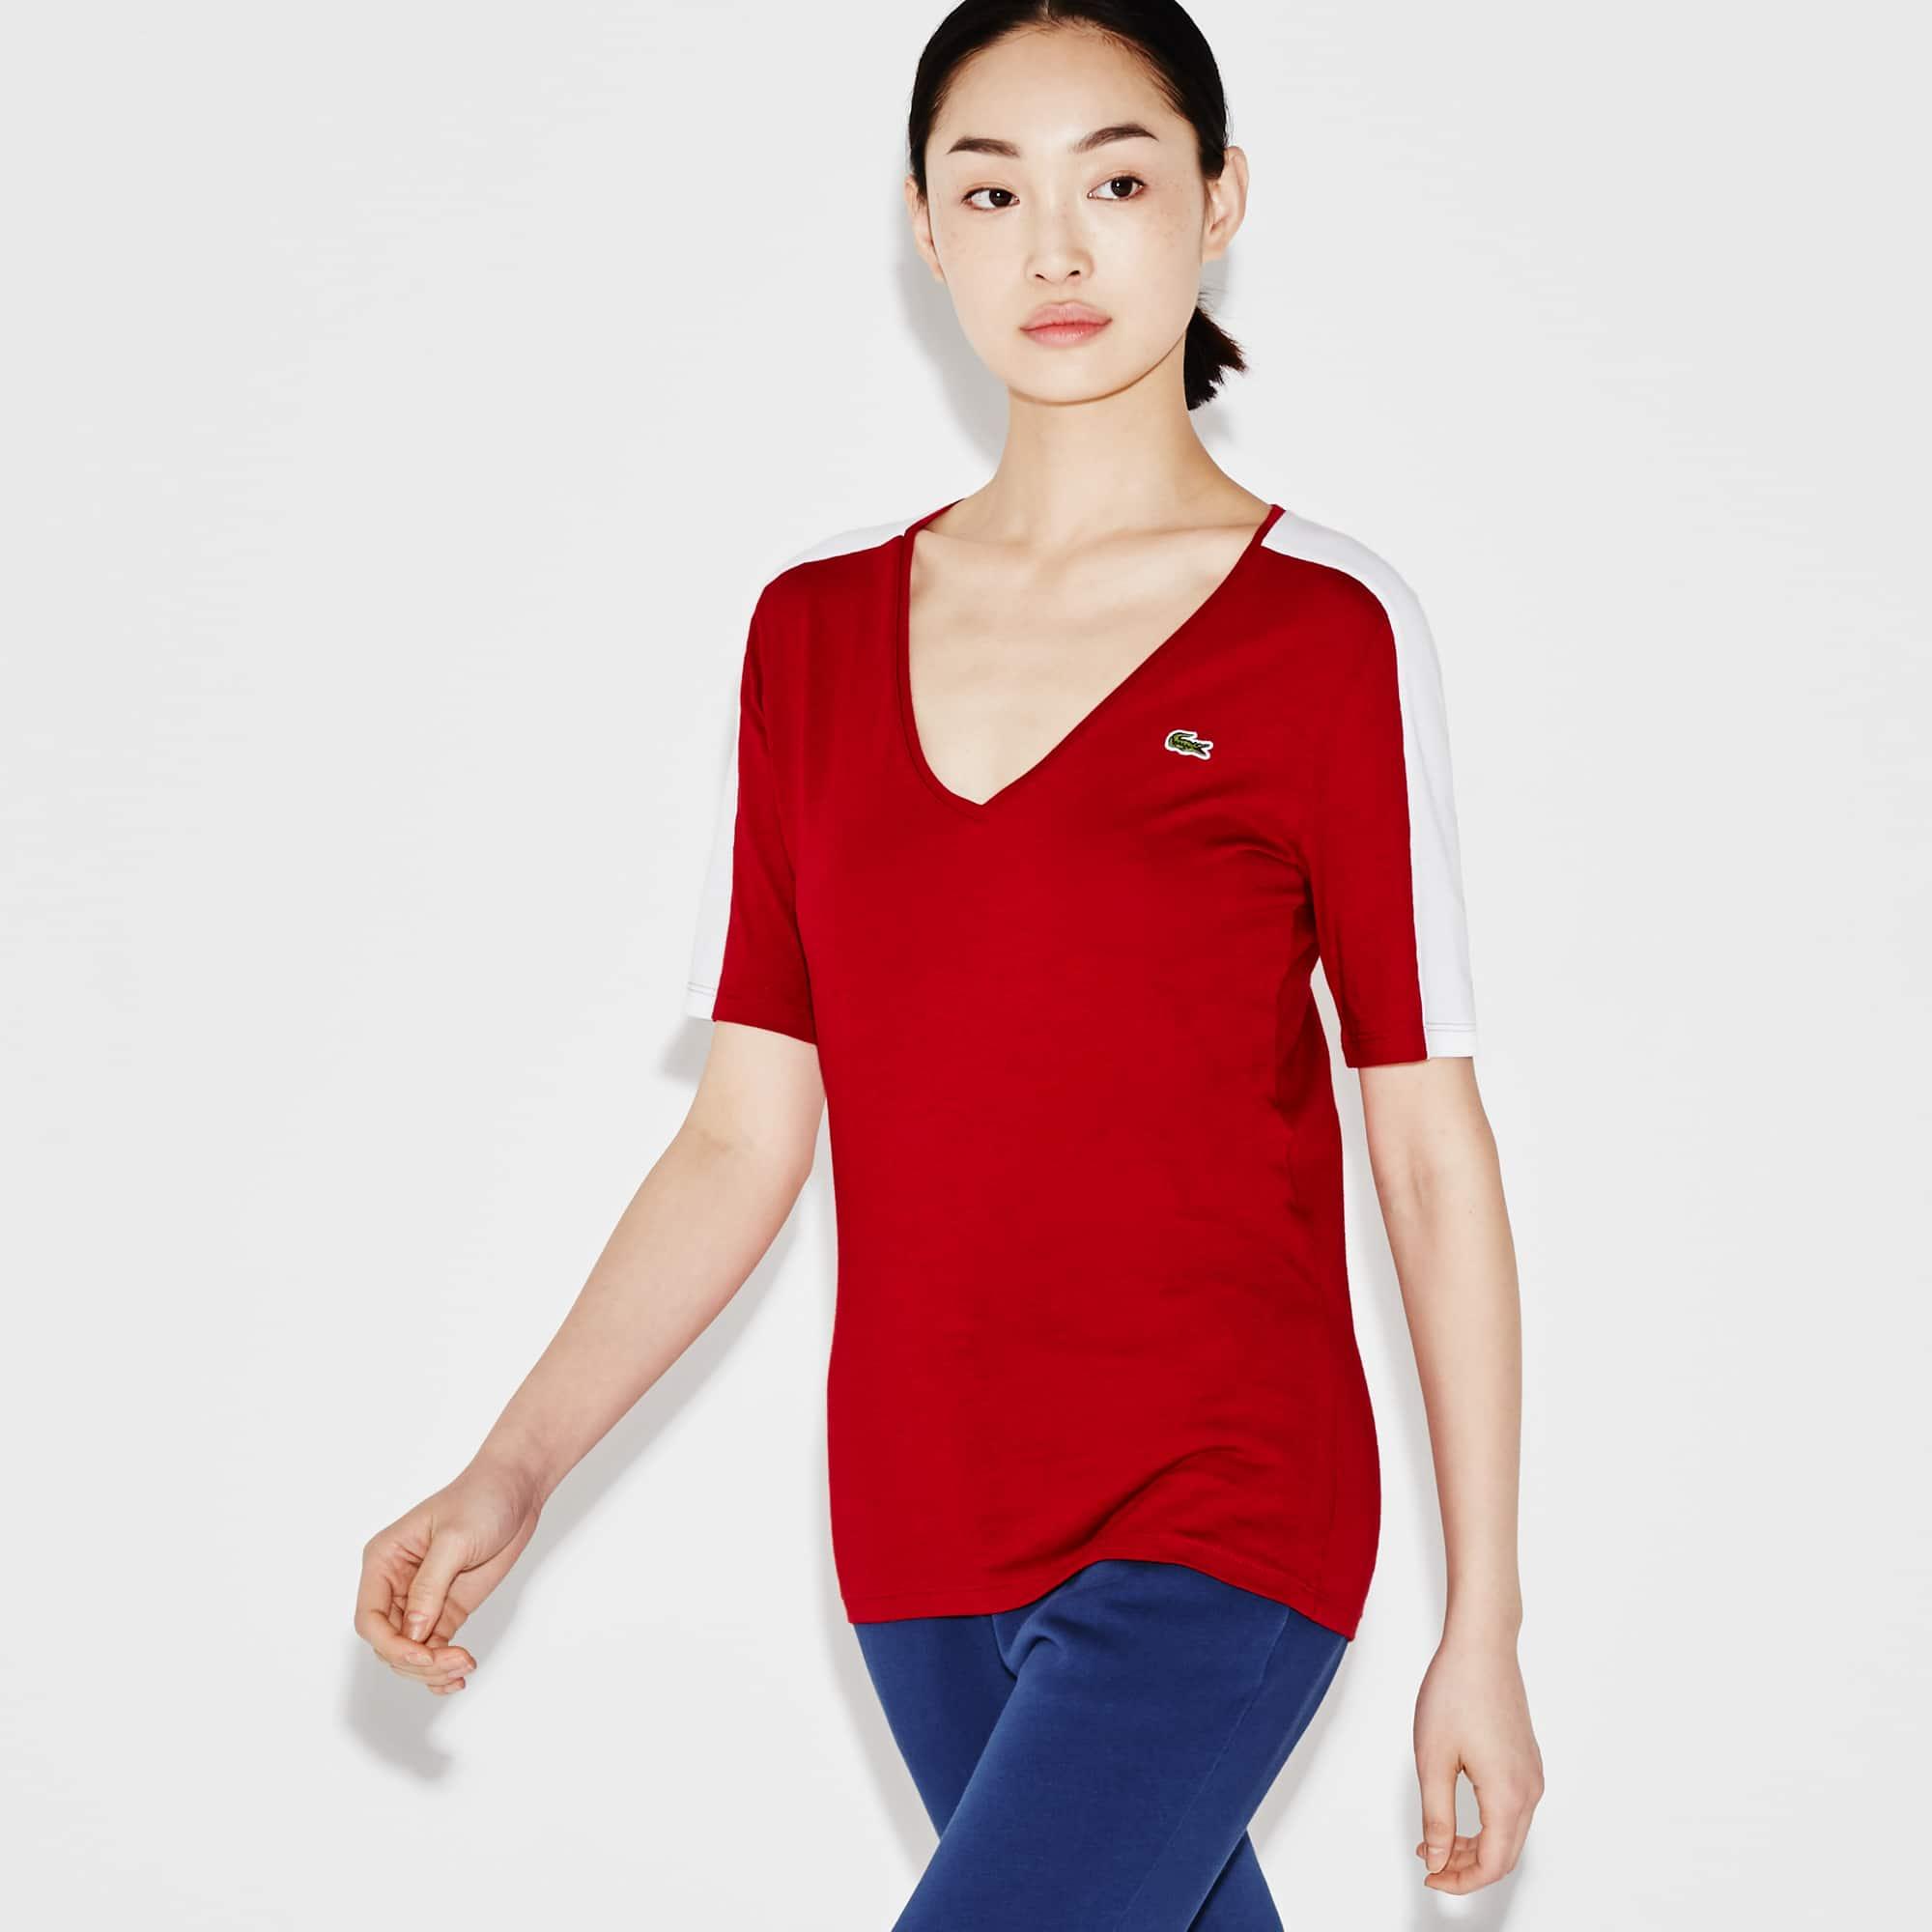 Women's Lacoste SPORT Tennis V-neck Flowing Jersey T-shirt